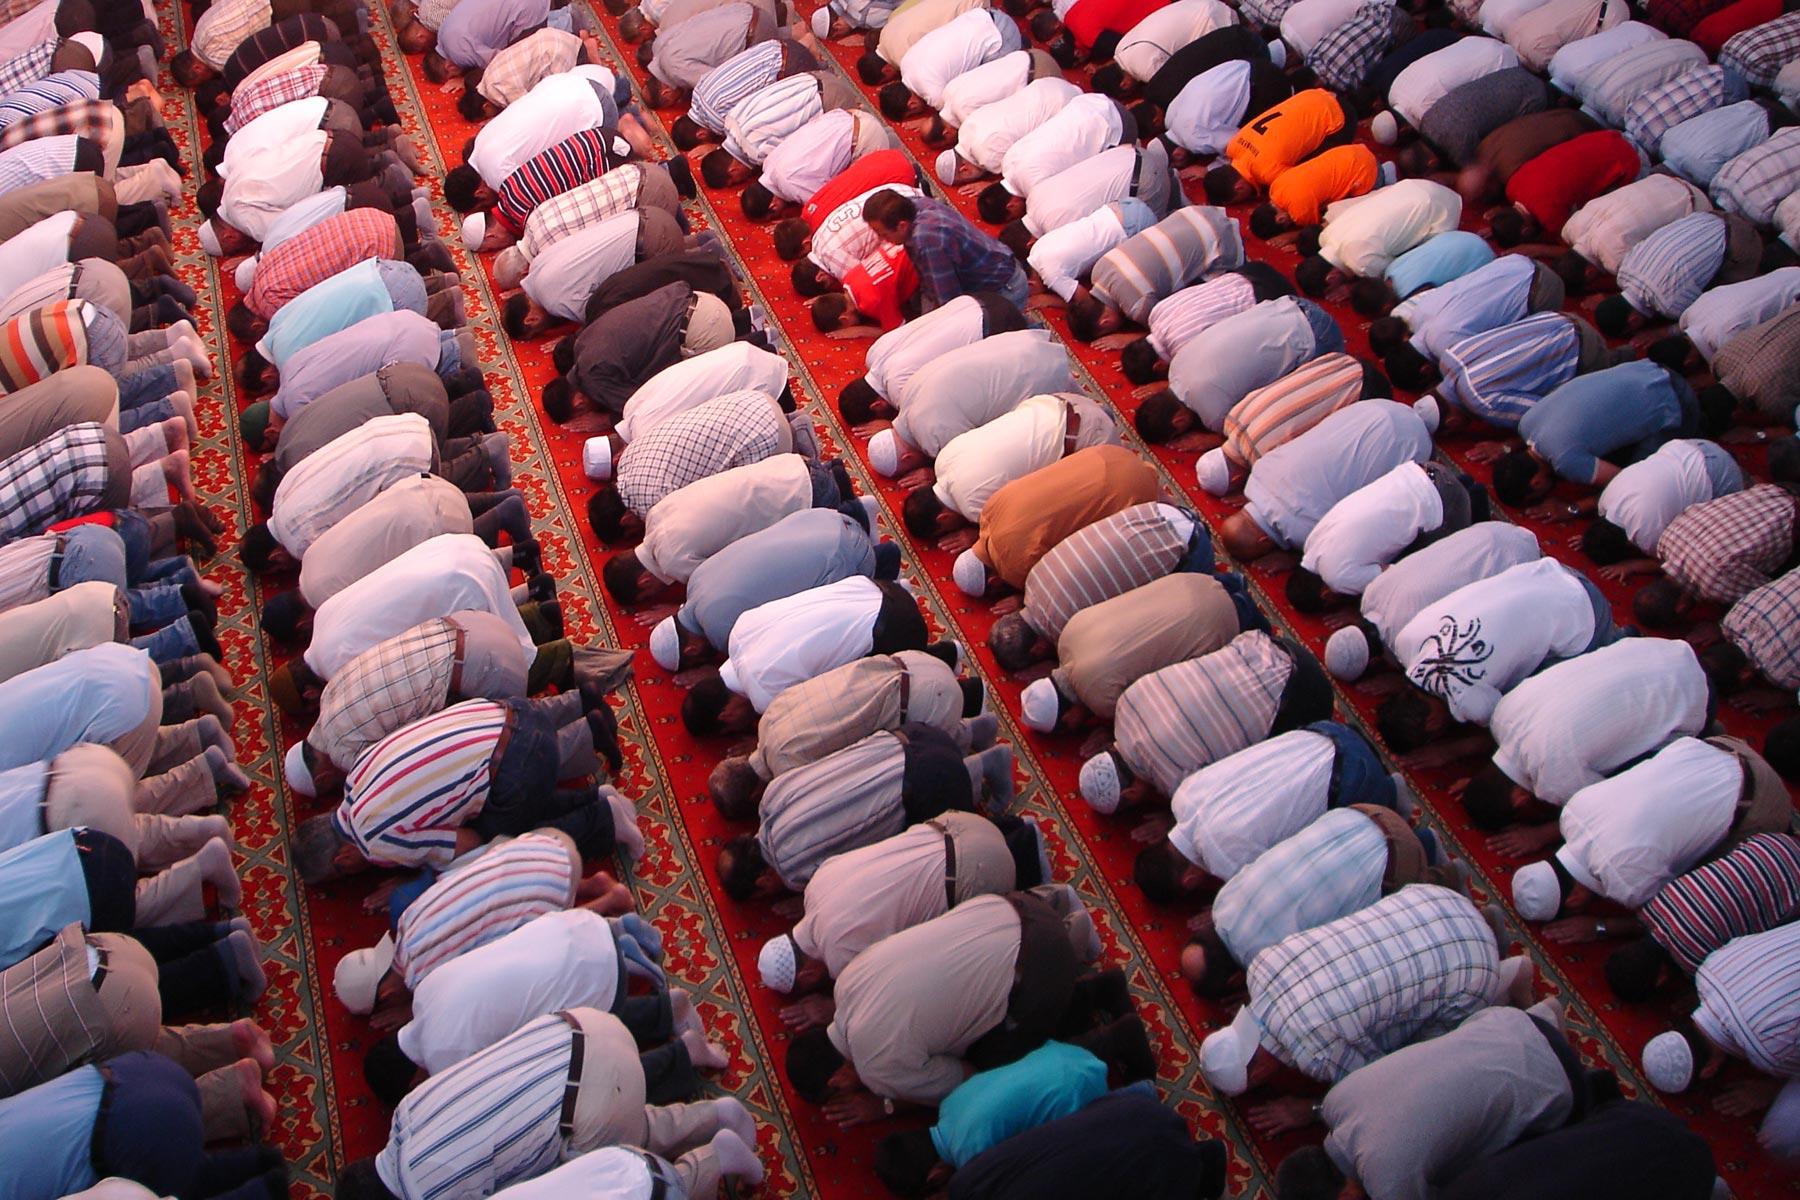 PHOTOES: Islamic Prayer – Salat • Elsoar